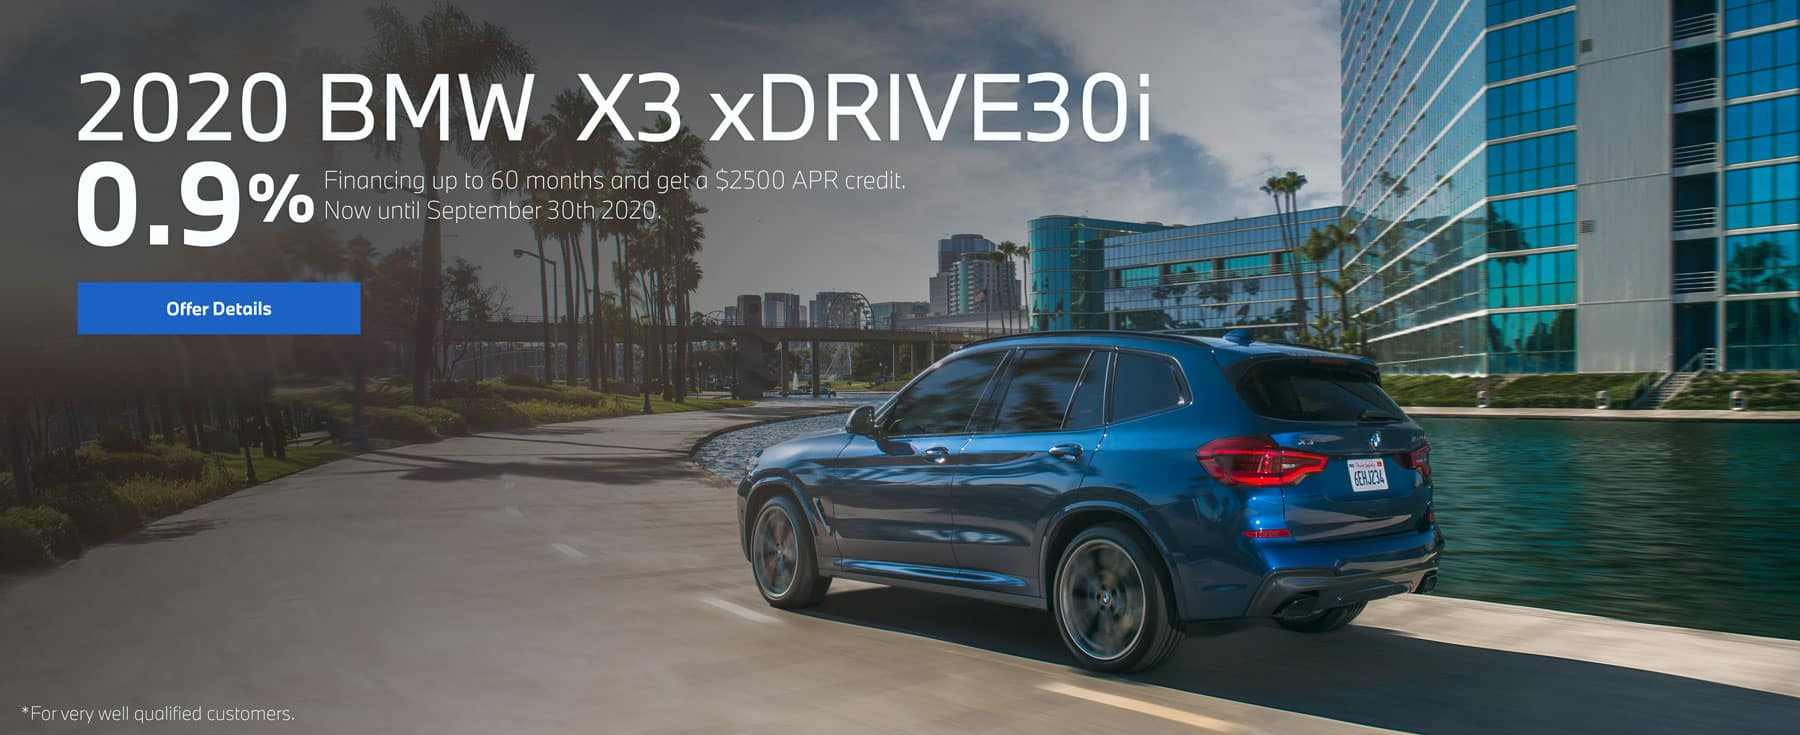 2020 BMW X3 0.9% offer